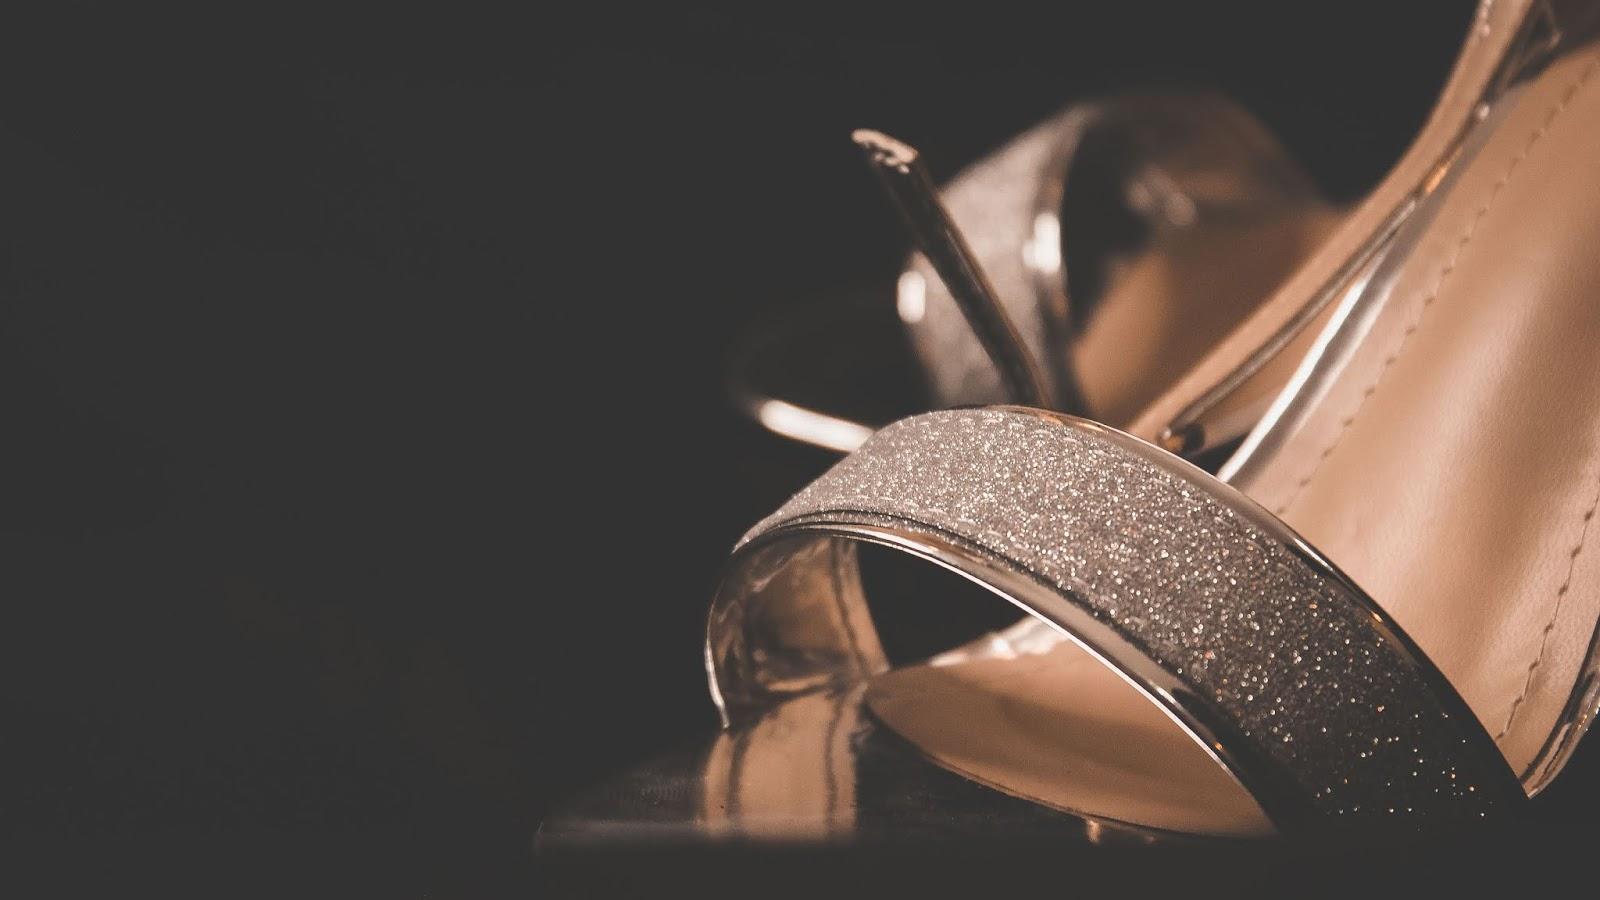 Sandali d'oro e d'argento: i consigli per indossarli